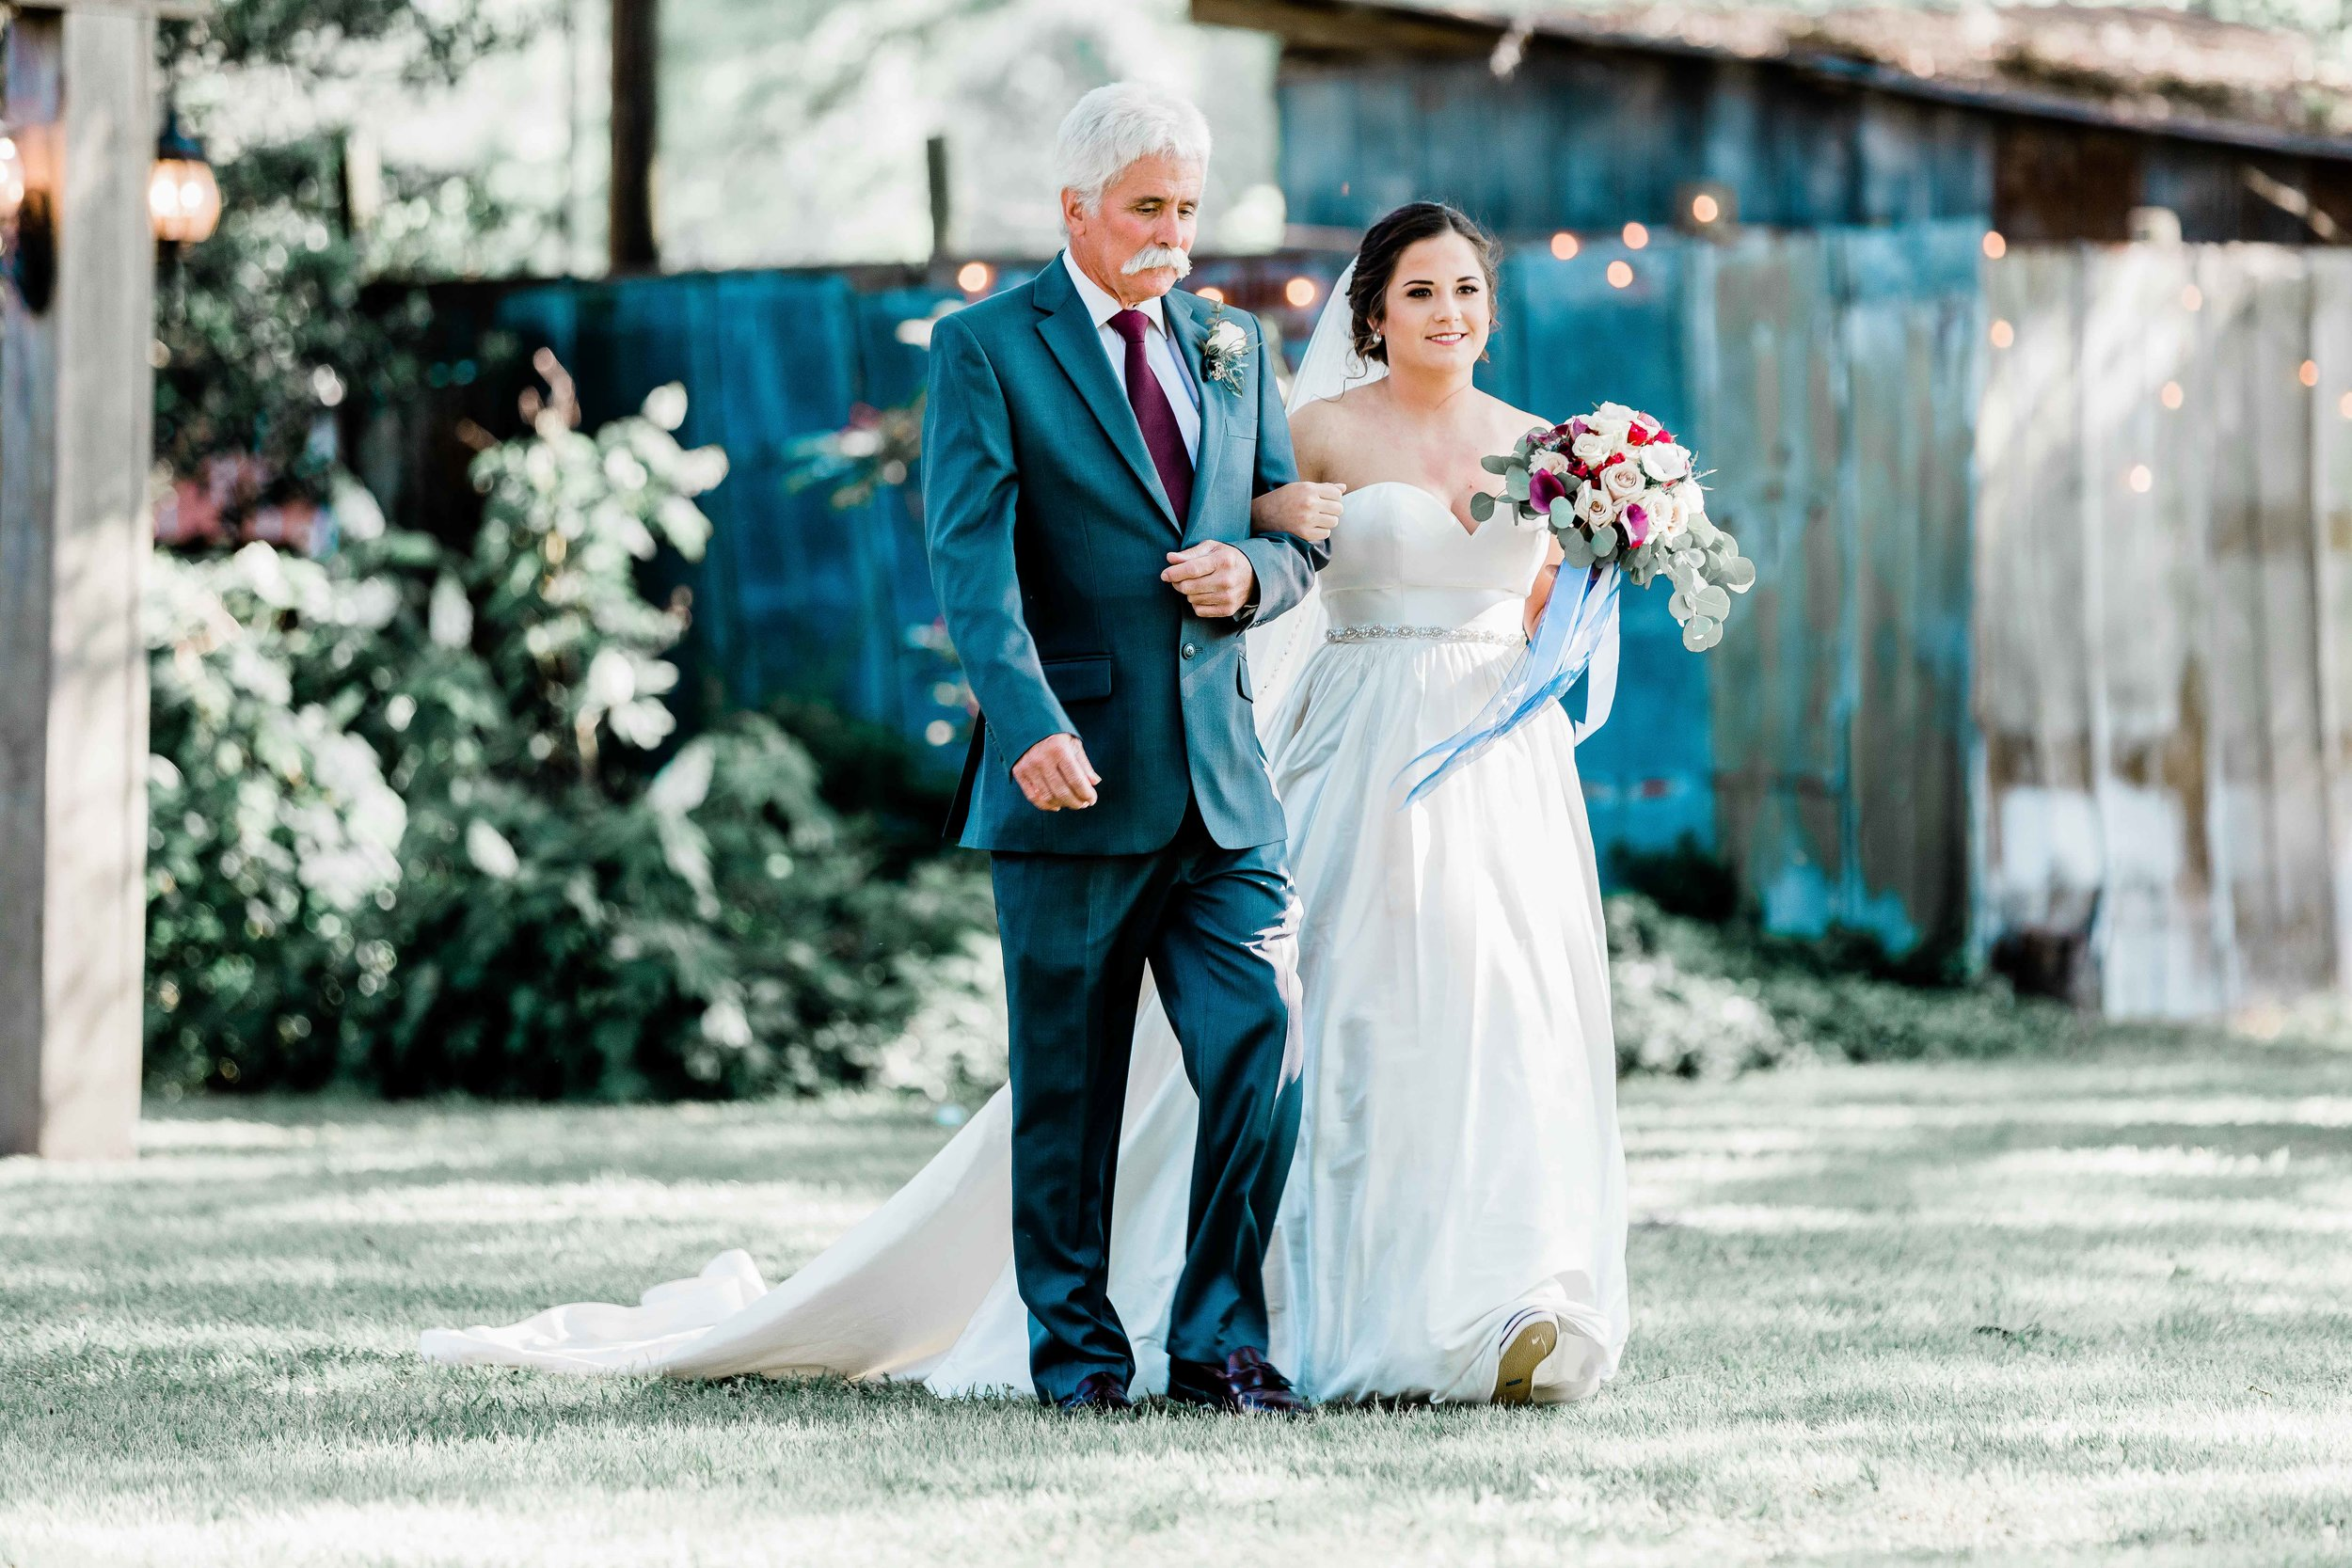 20190427-Southern Lens Photography- Savannah Wedding Photographer-Screven and Caroline-201962.jpg